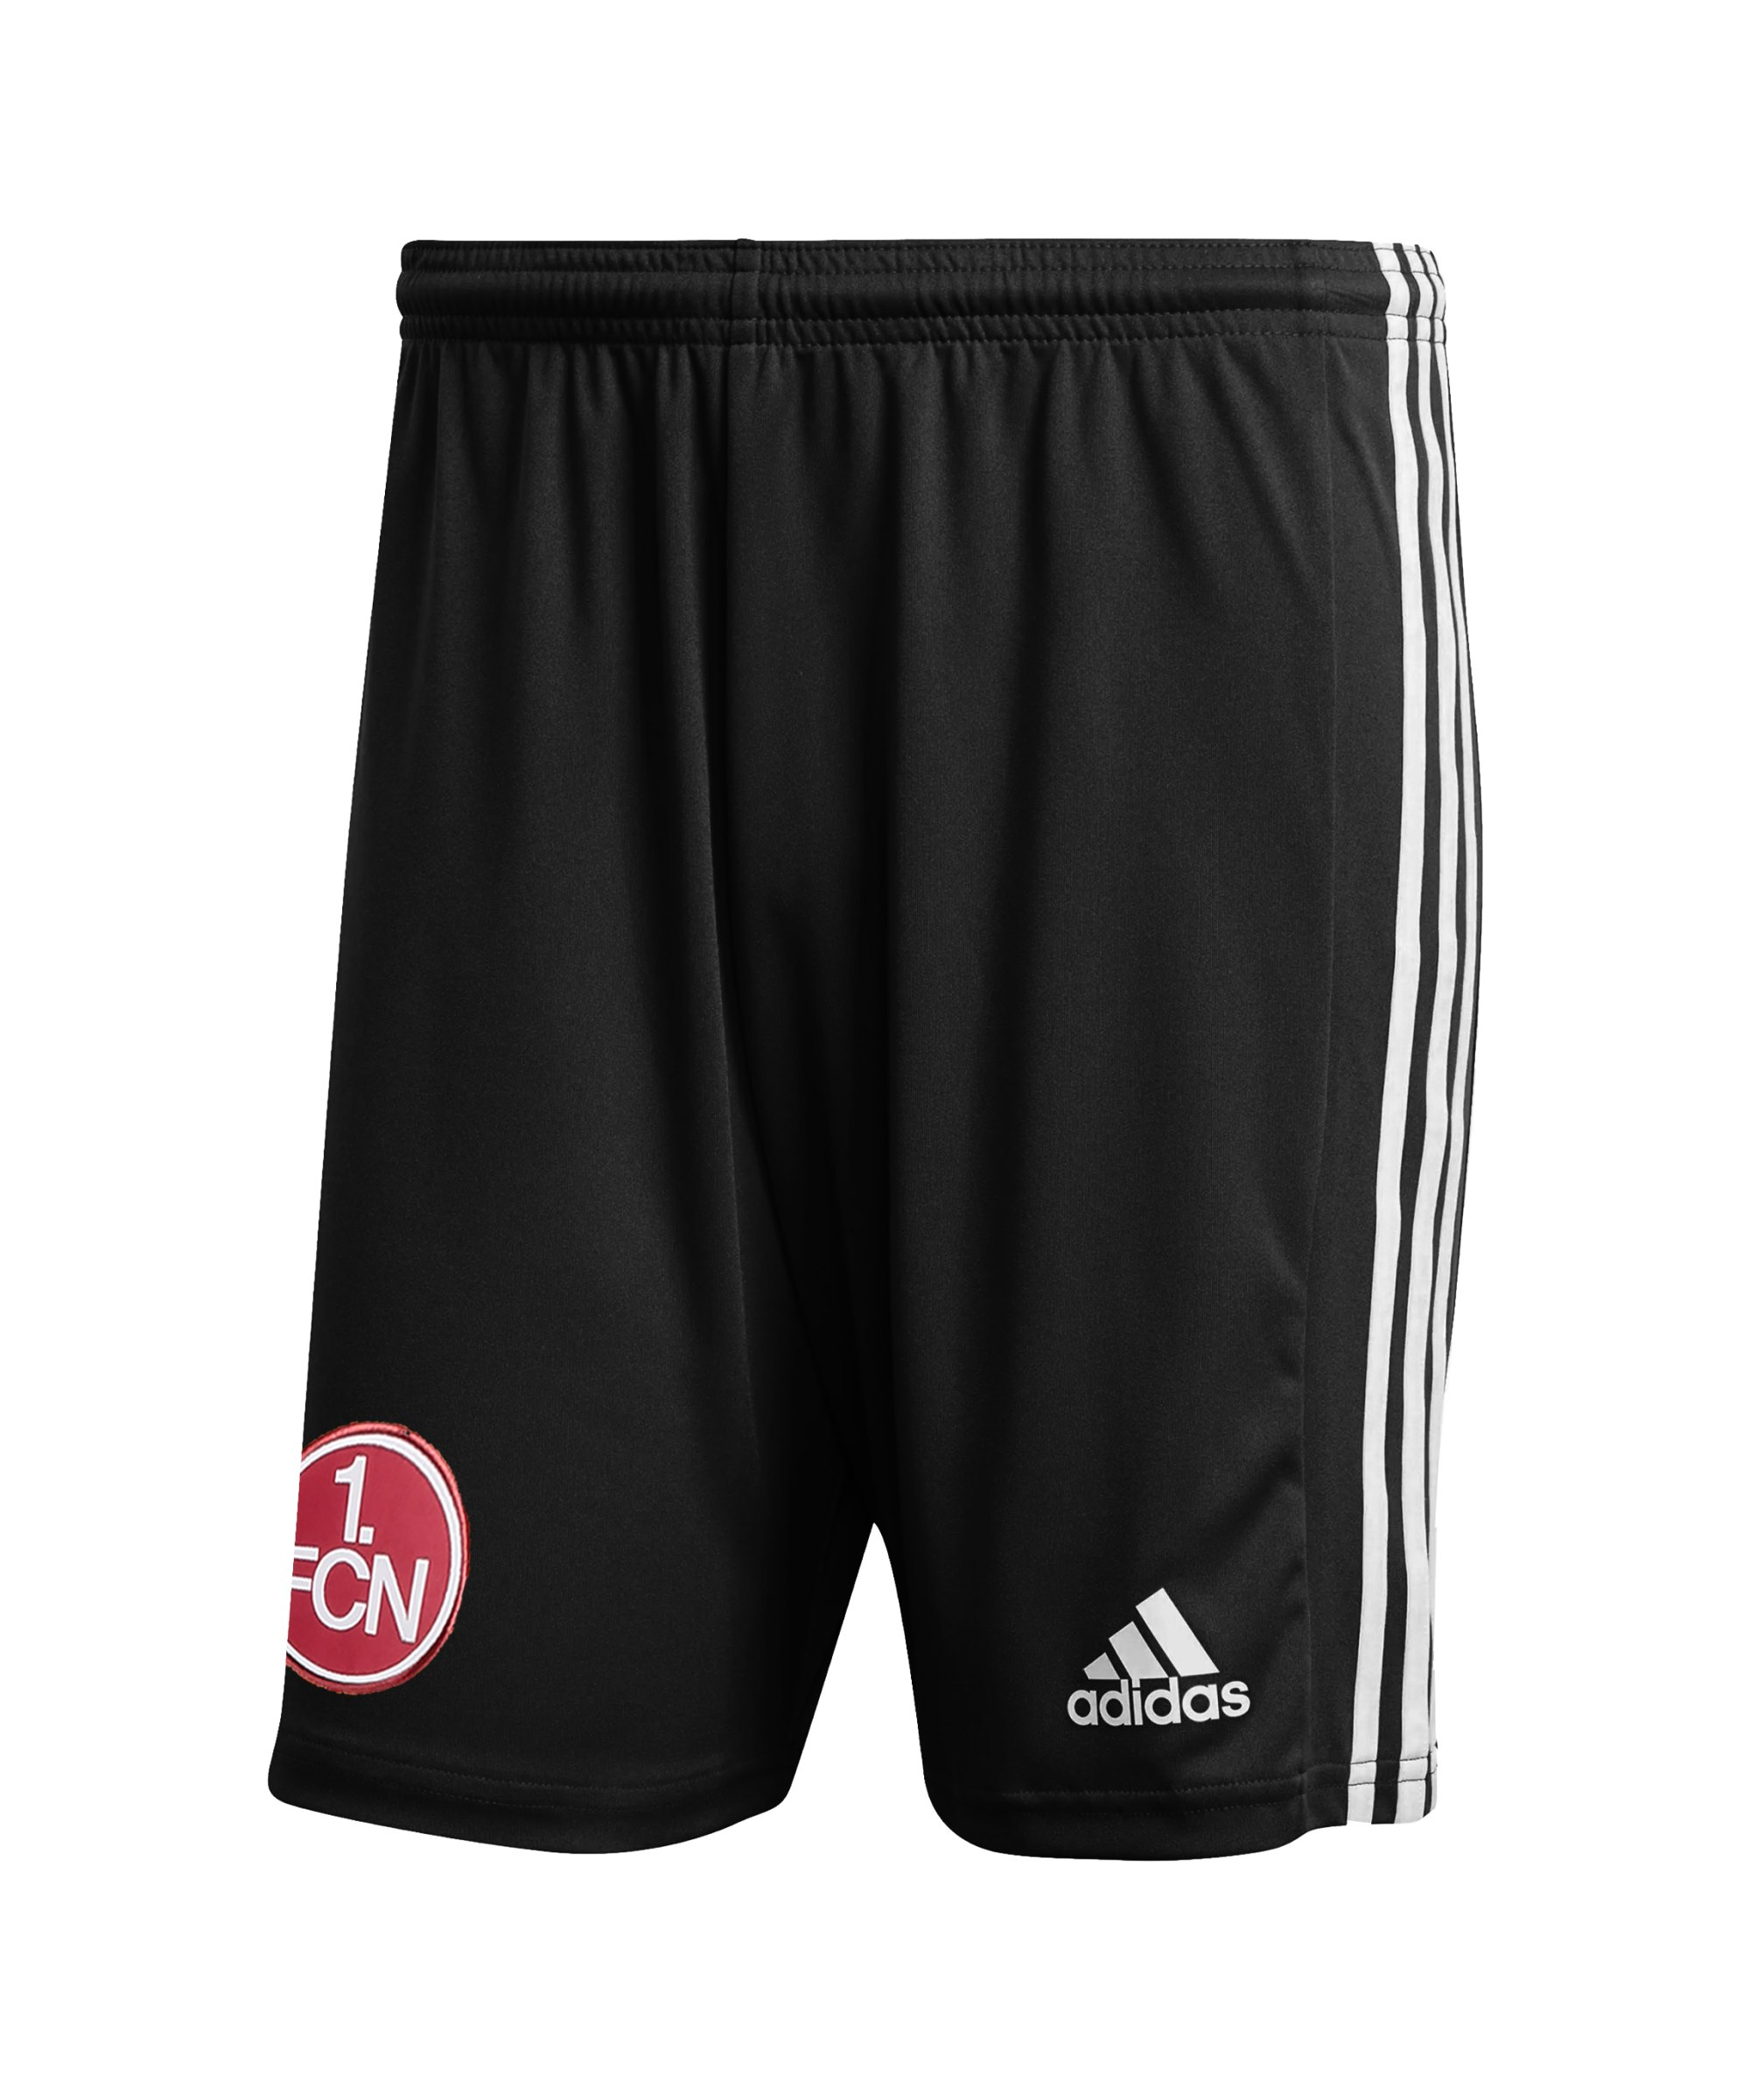 adidas 1. FC Nürnberg Short 3rd 2021/2022 Kids Schwarz - schwarz